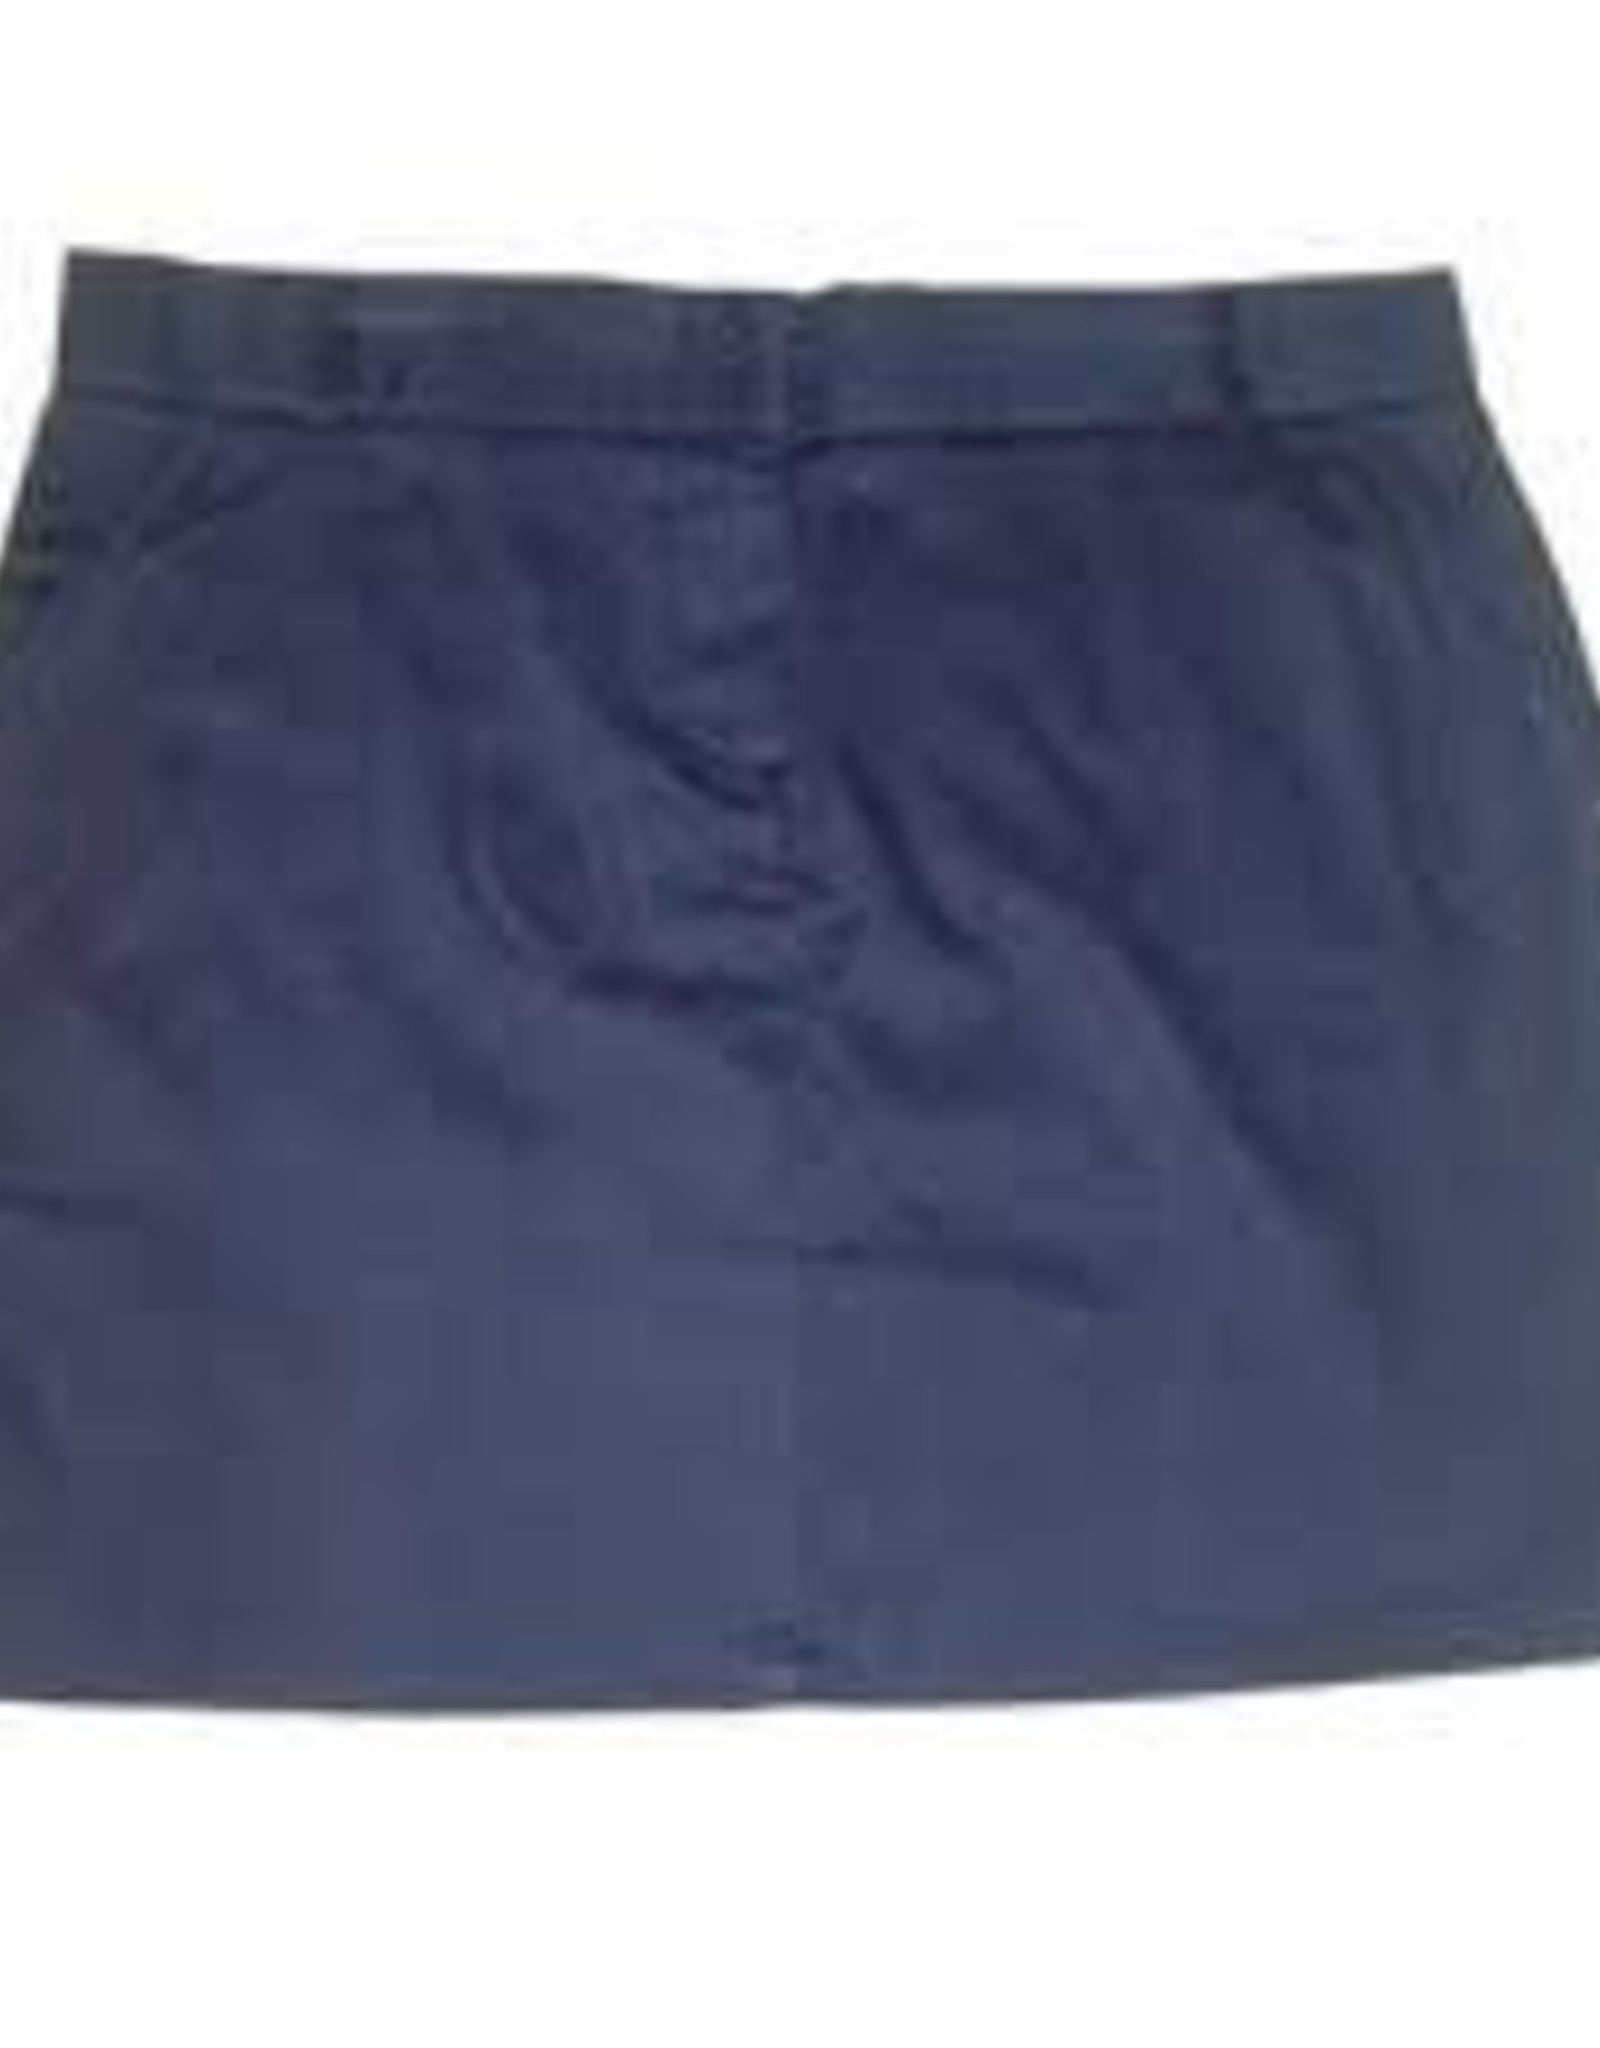 Thomas Cook Thomas Cook Slant Pocket Skirt - Navy - Size 16